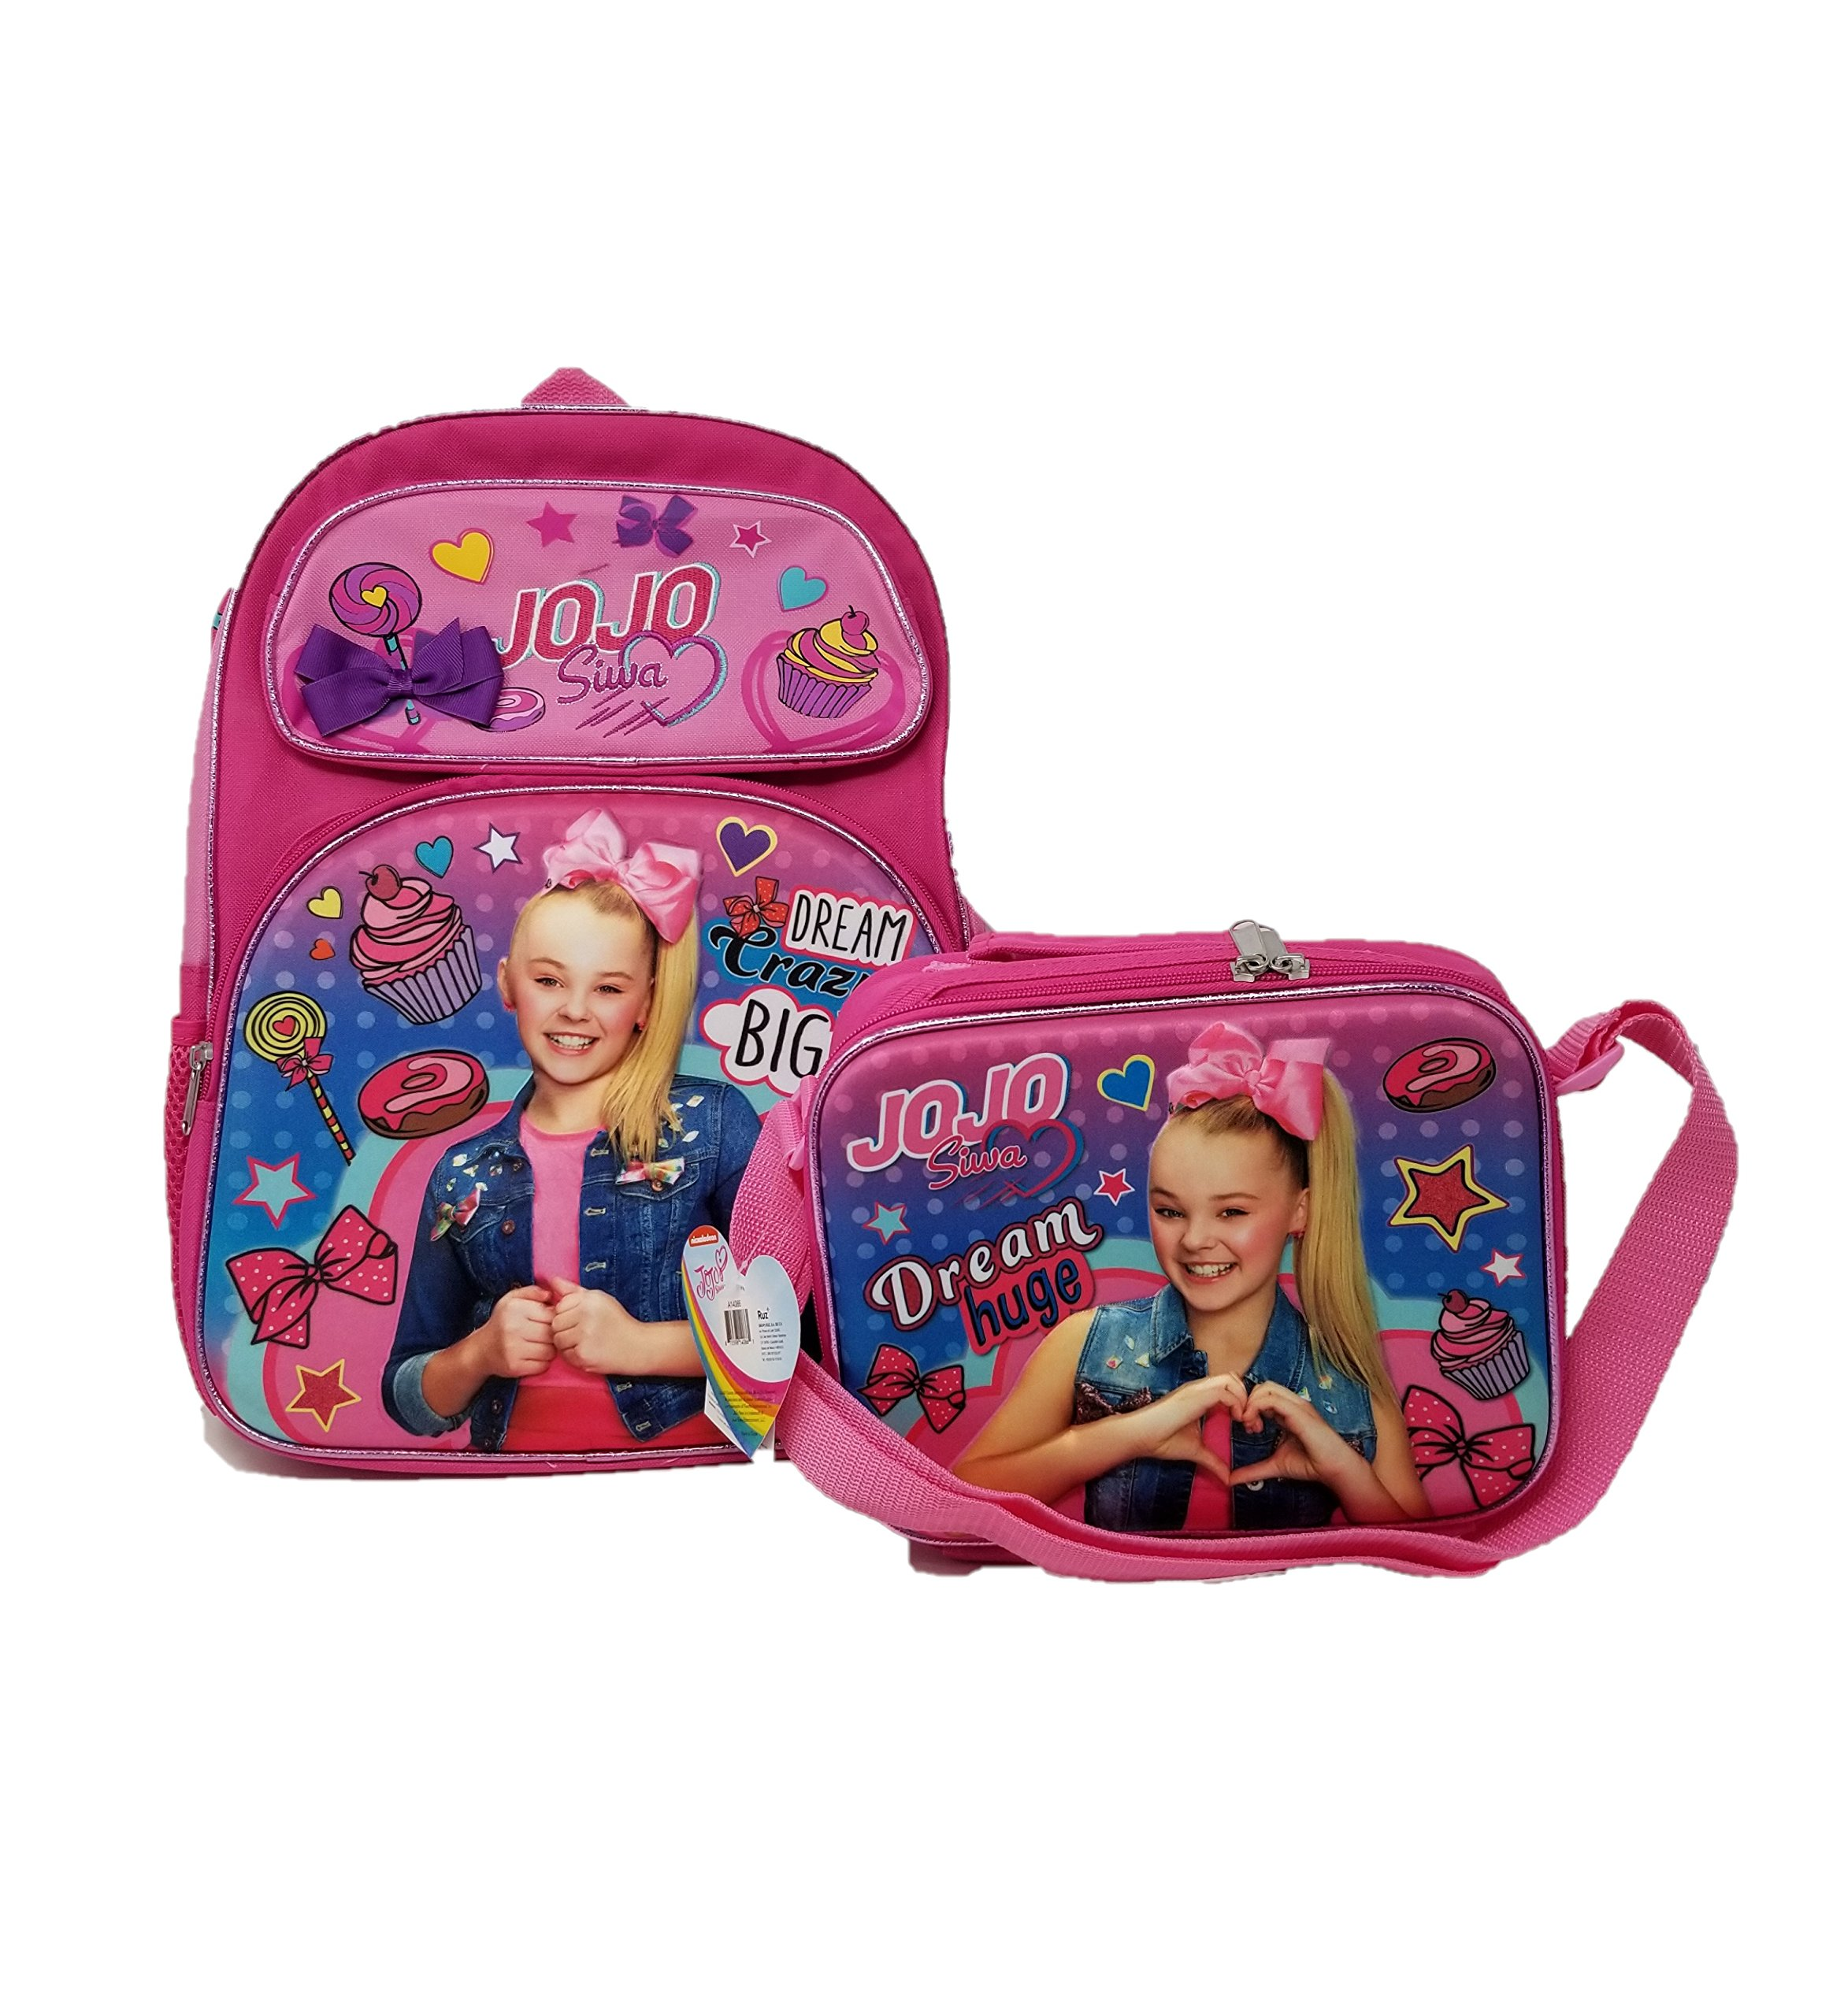 7f3667af5a1b JOJO SIWA in Blue Jeans Zippered Girls' Heavy Duty Backpack